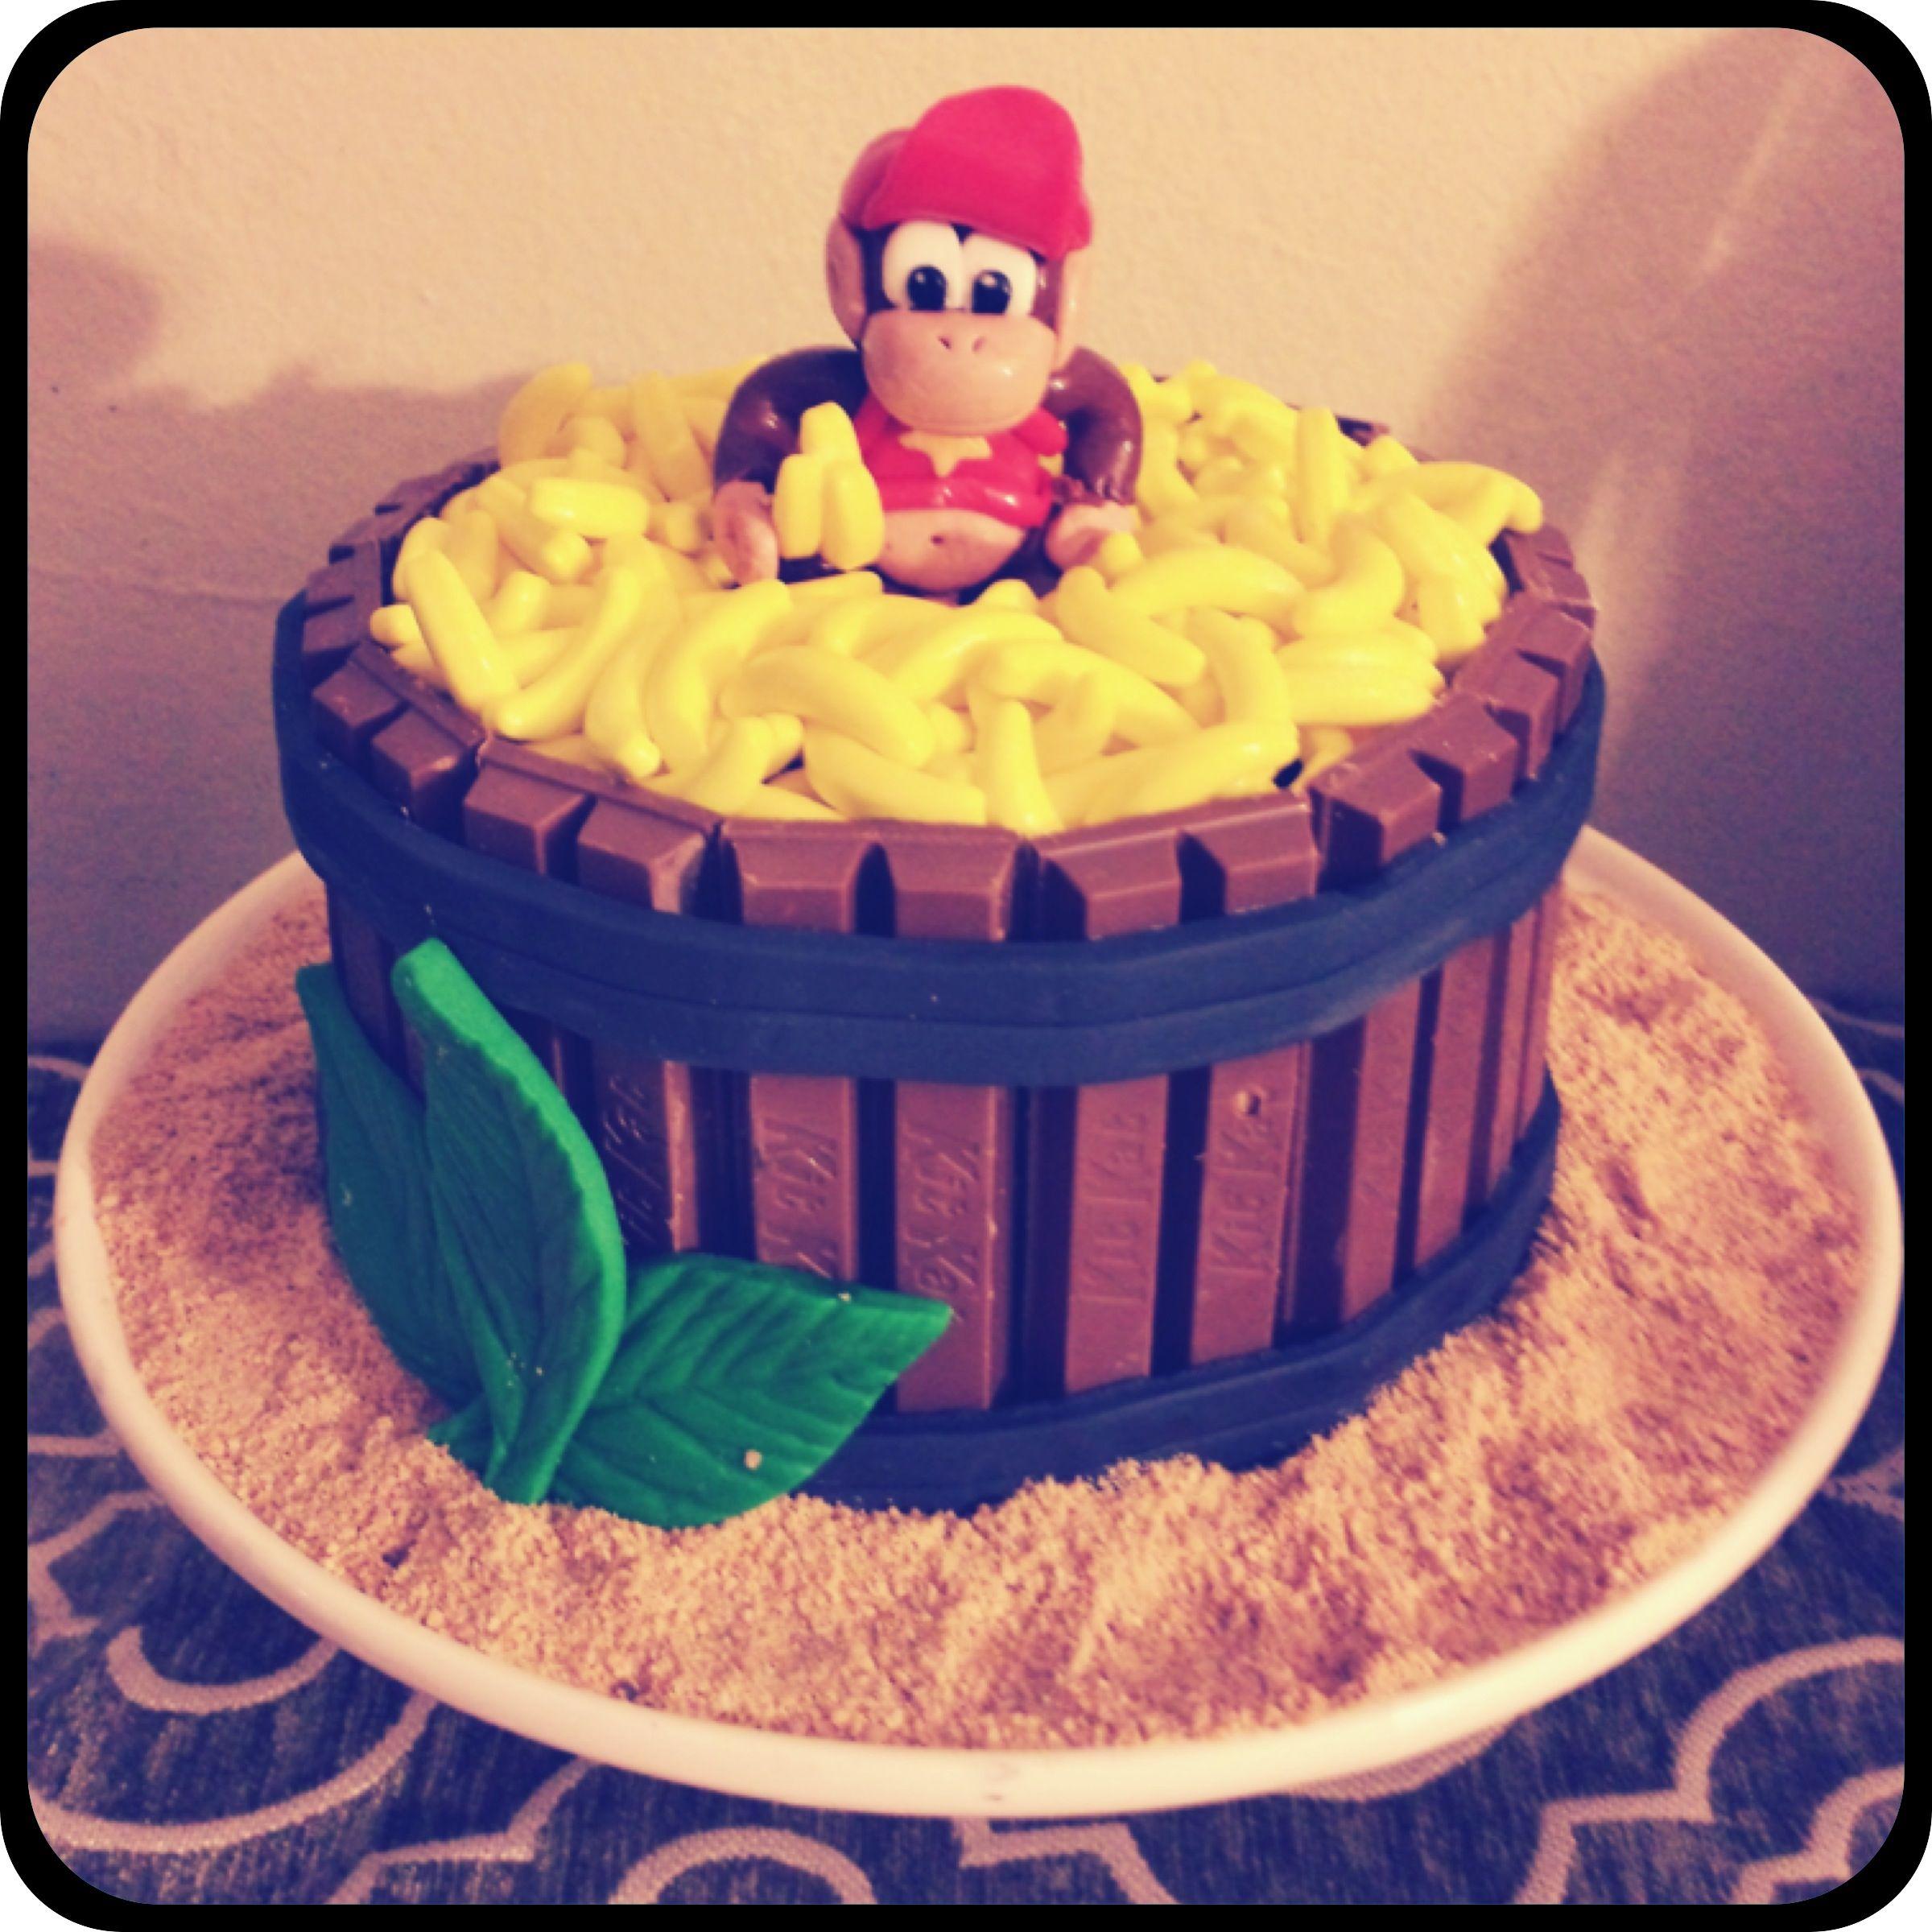 Diddy Kong Cake Donkey Kong Donkey kong party, Video